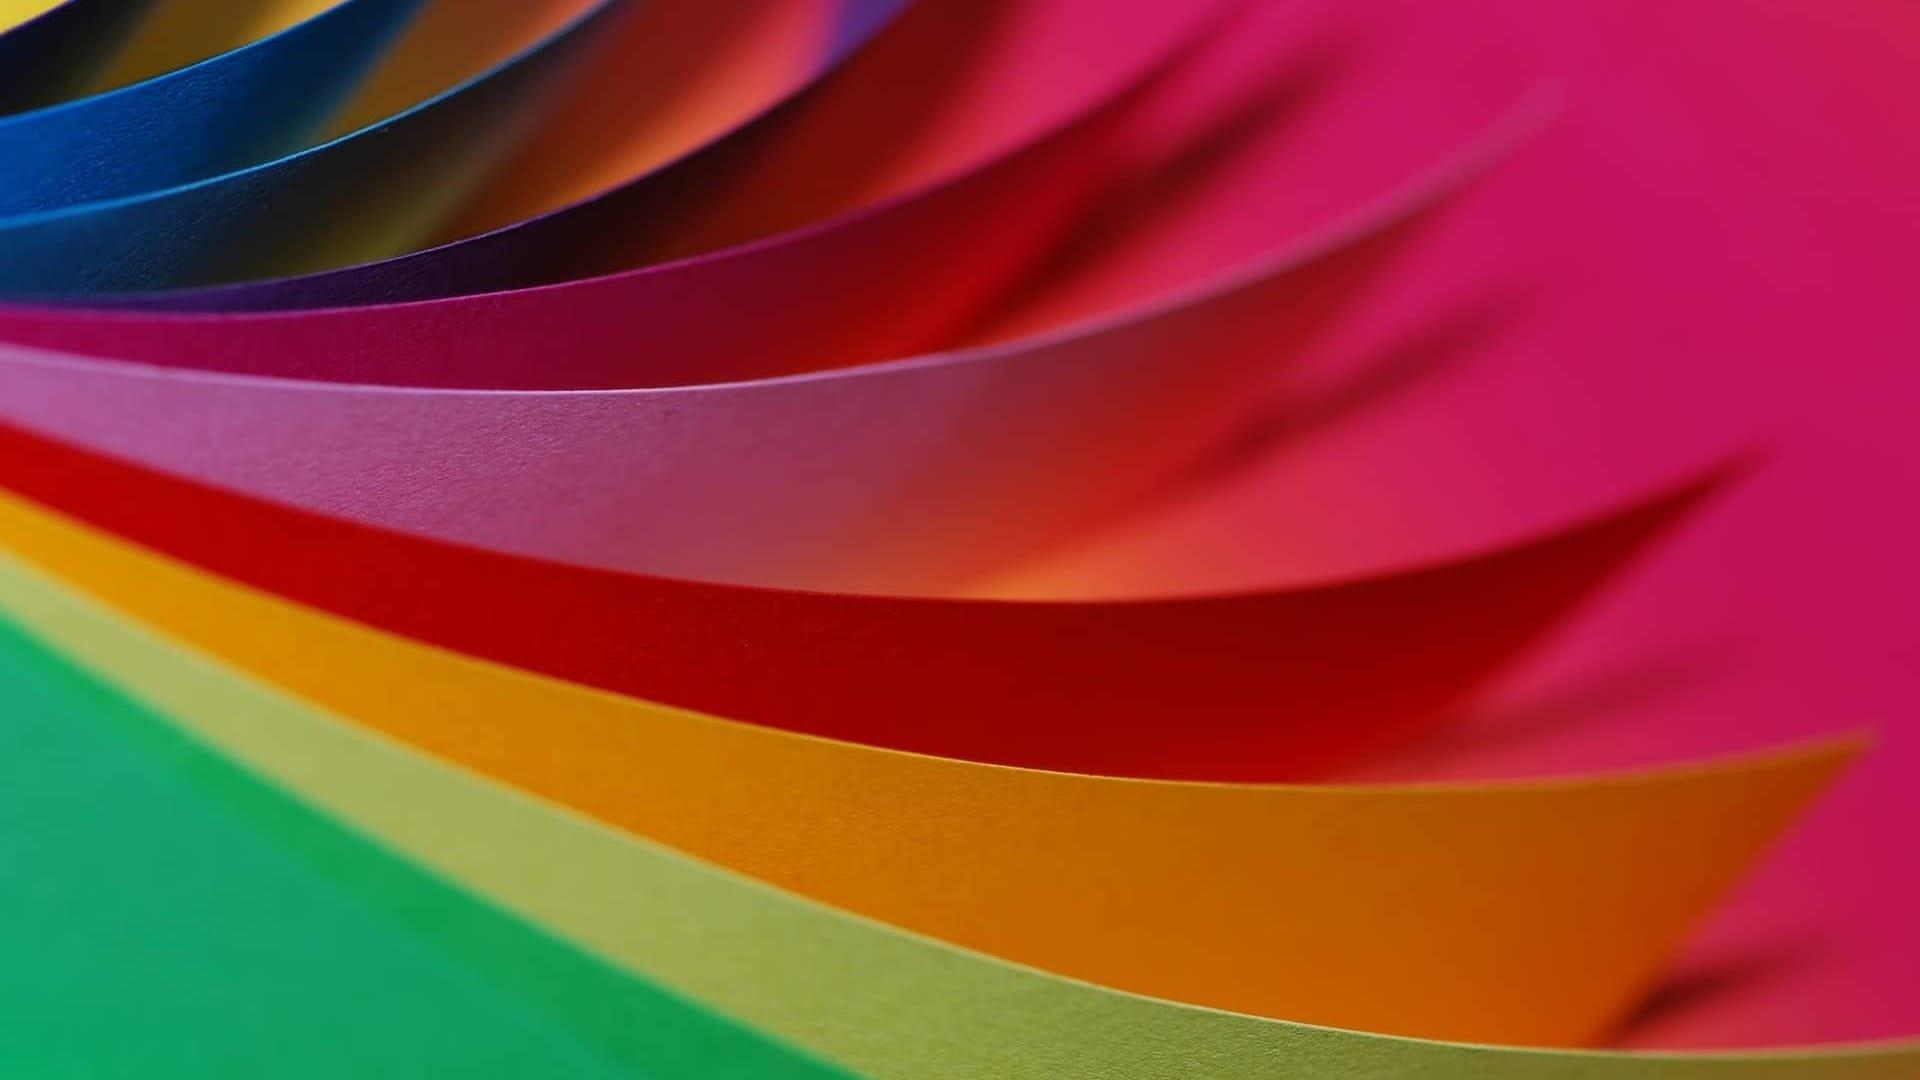 Carta da parati a bergamo i migliori 40 posatori di carta for Le migliori aziende di carta da parati